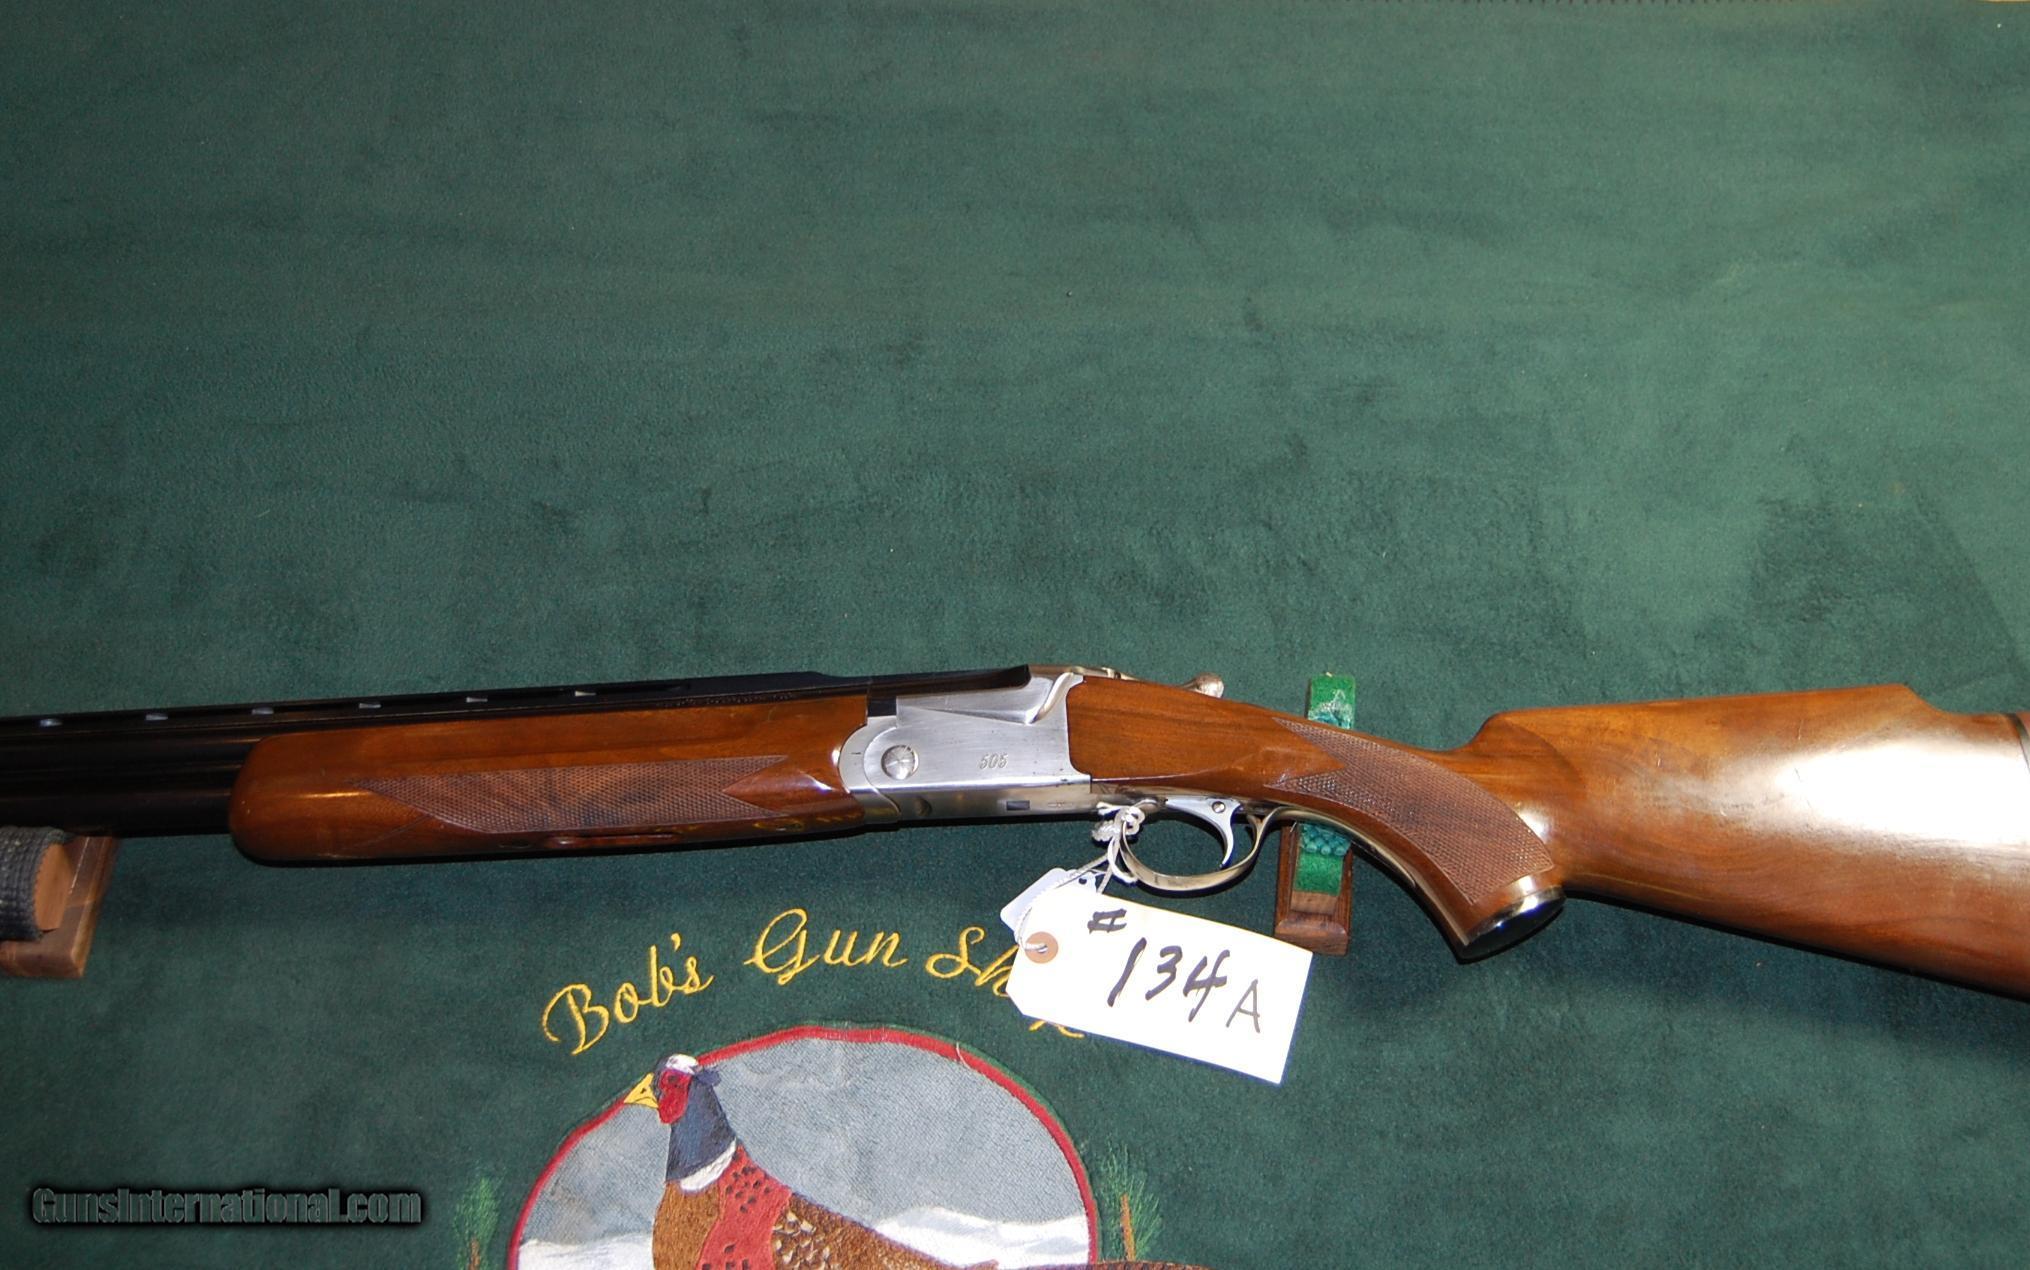 Skb shotguns model 505